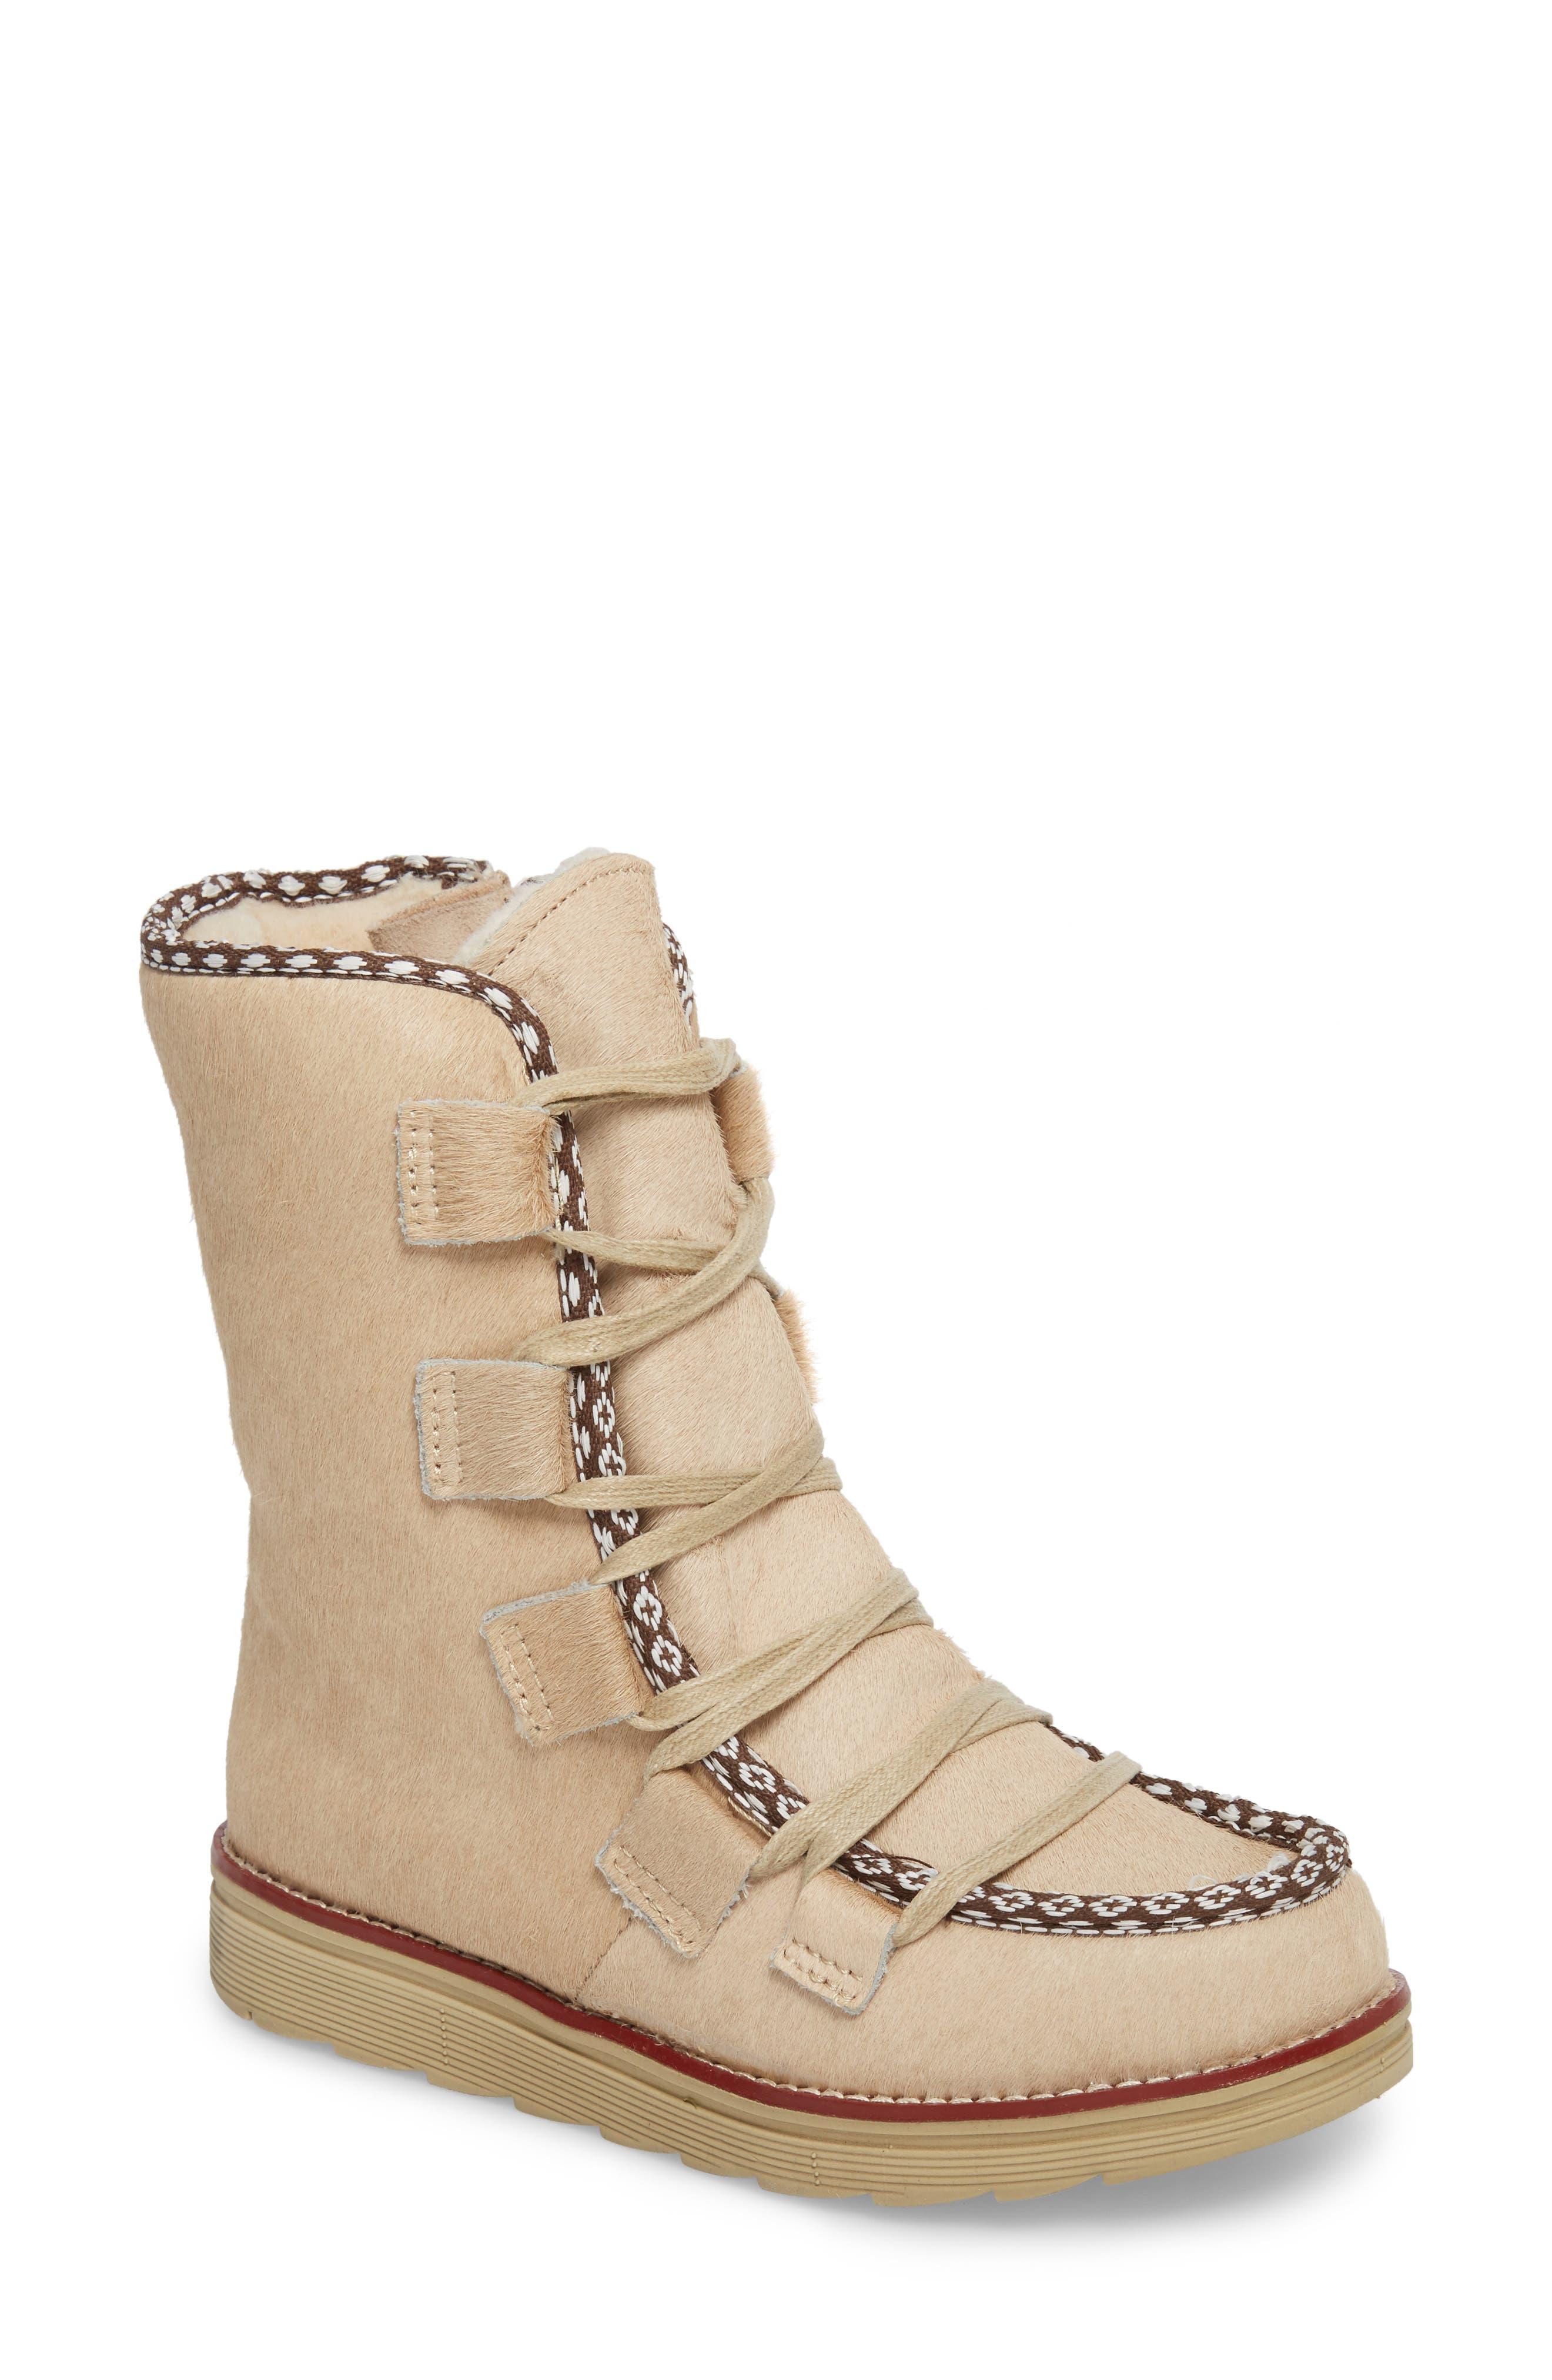 Alternate Image 1 Selected - Royal Canadian Kitchener Waterproof Genuine Calf Hair Snow Boot (Women)